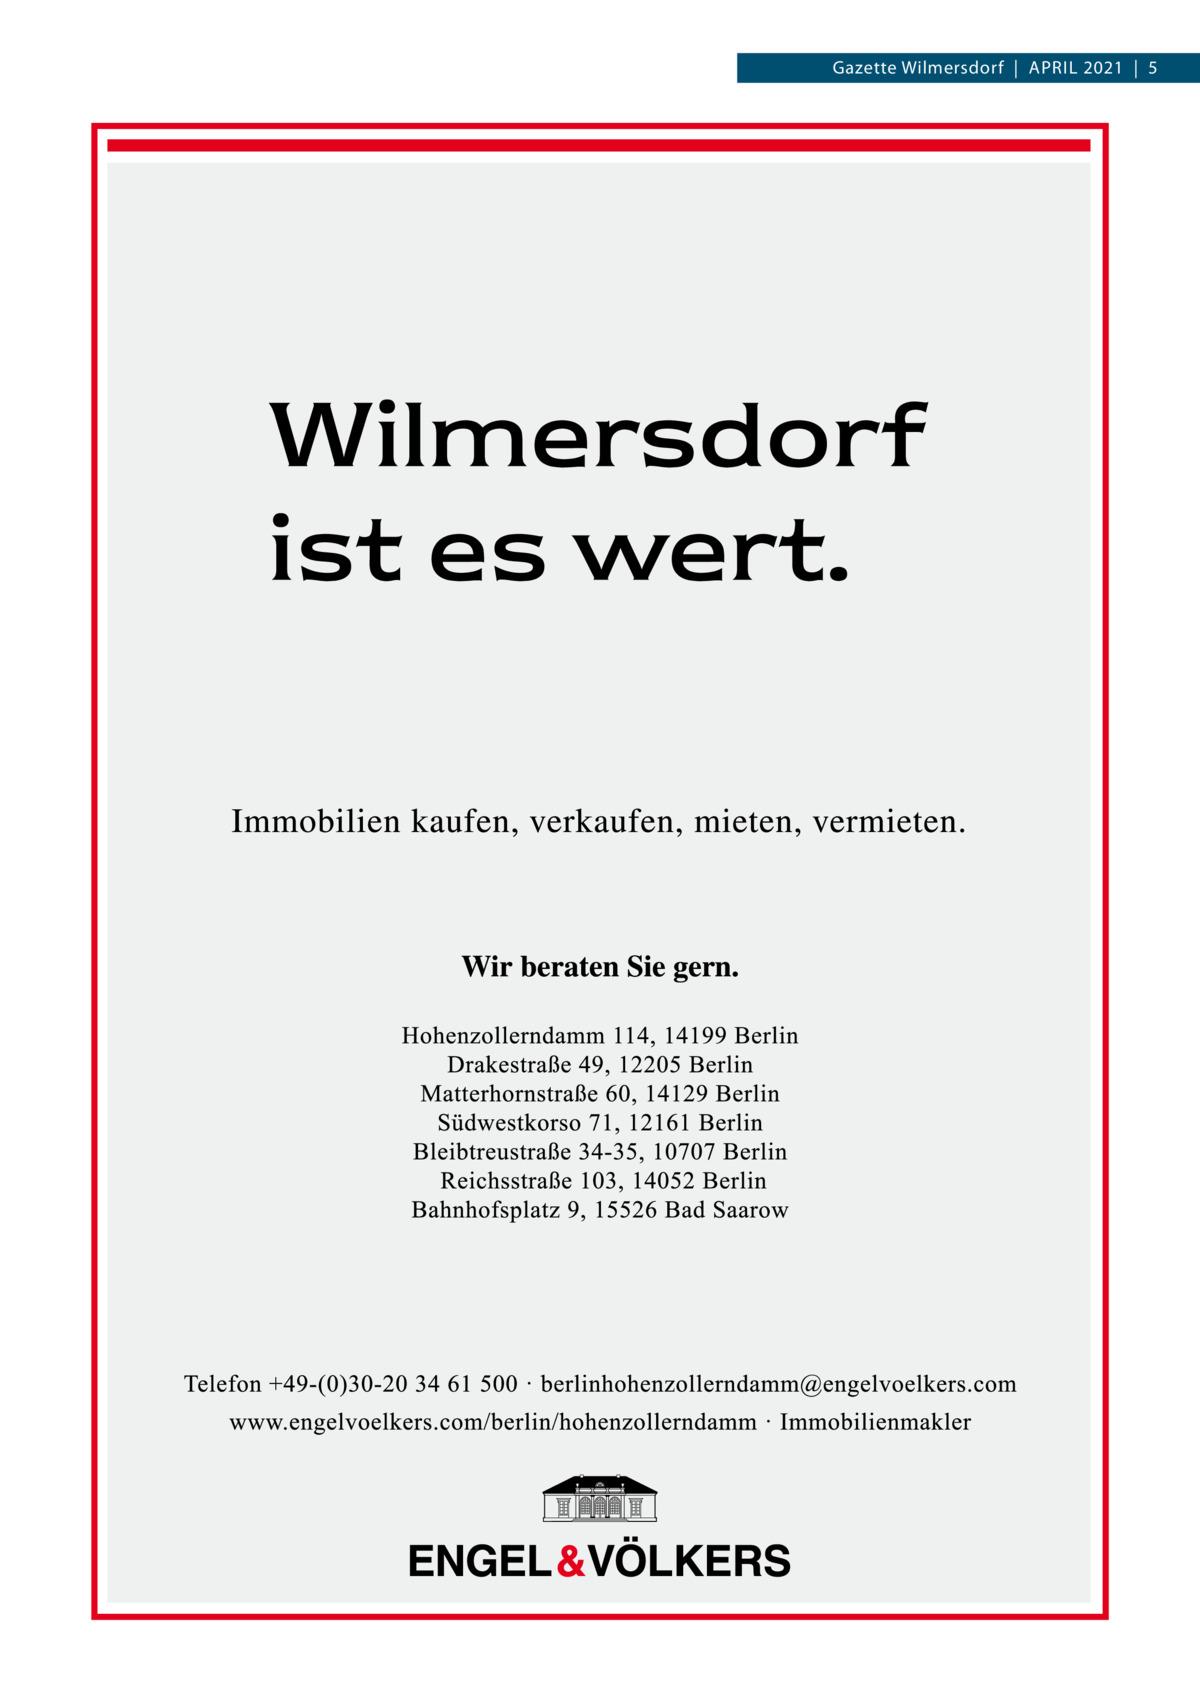 Gazette Wilmersdorf|April 2021|5